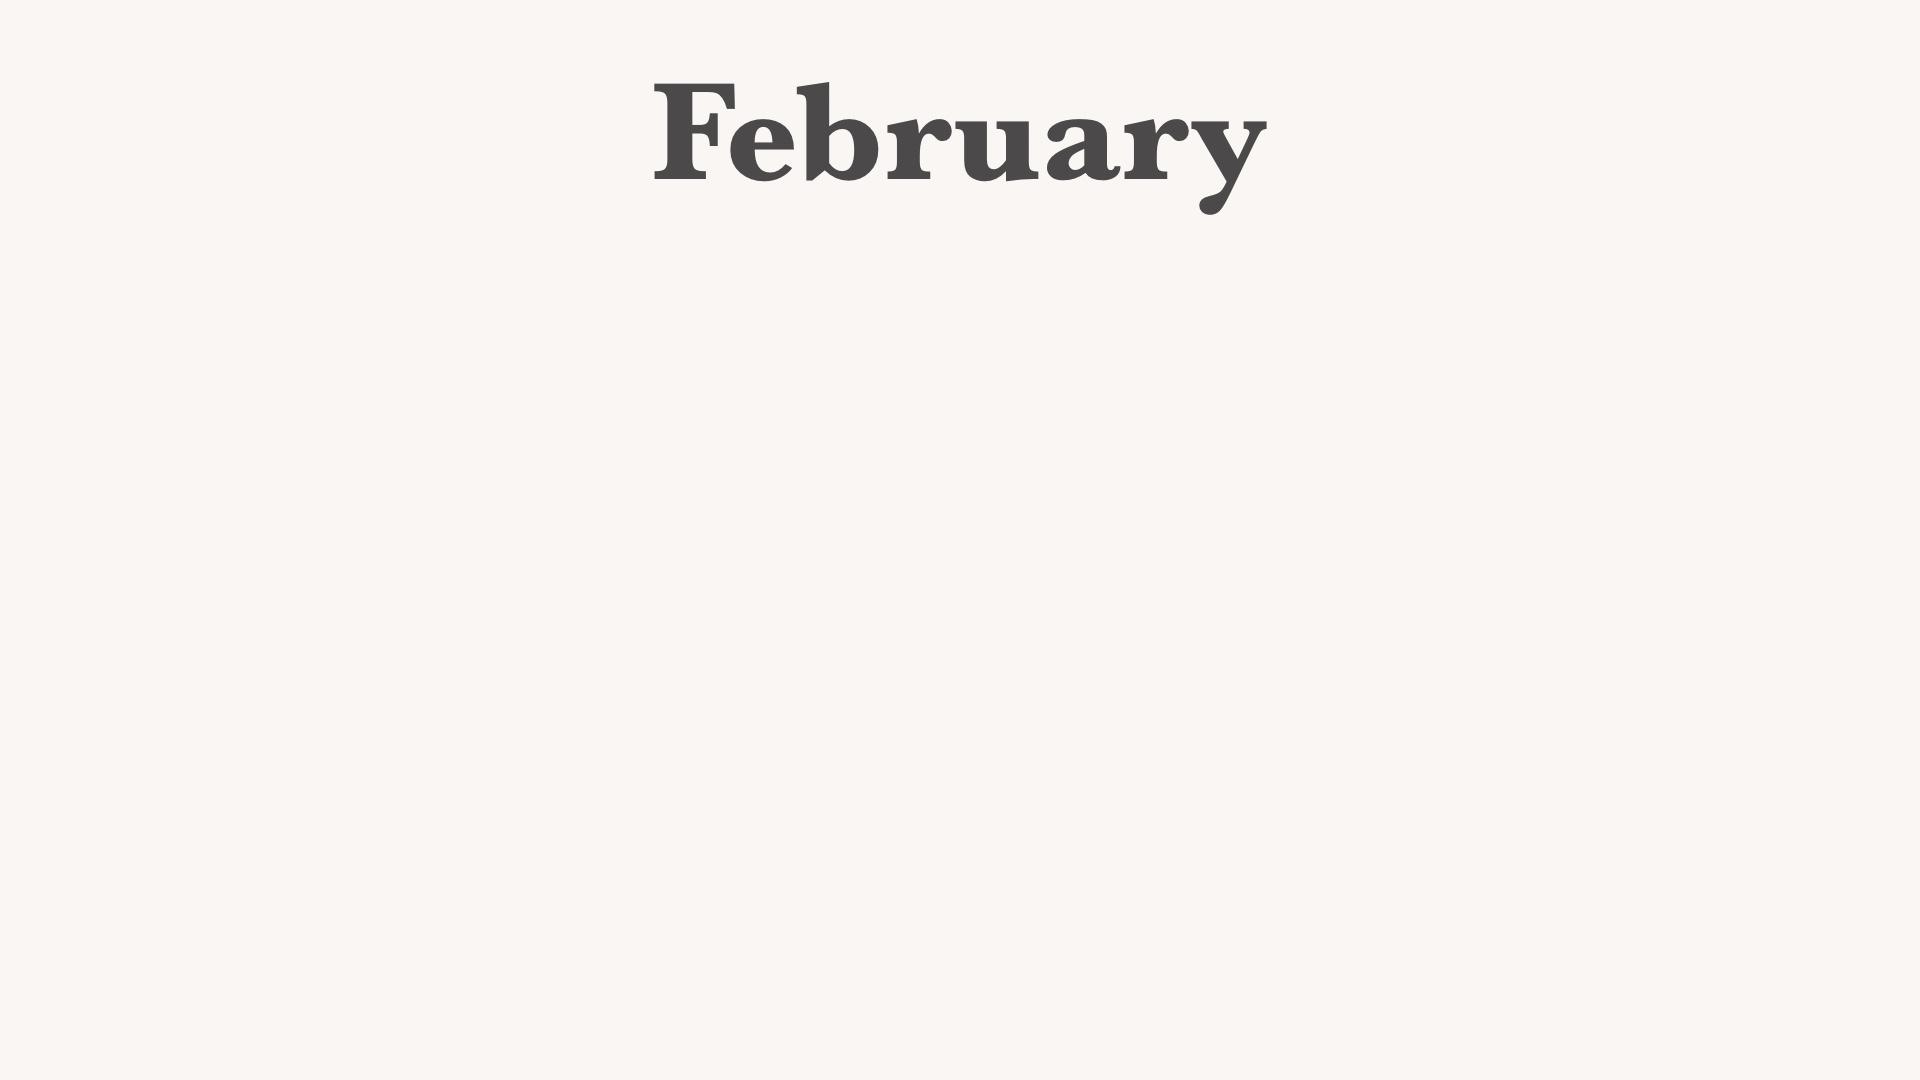 Februraryと入った白っぽいバーチャル背景